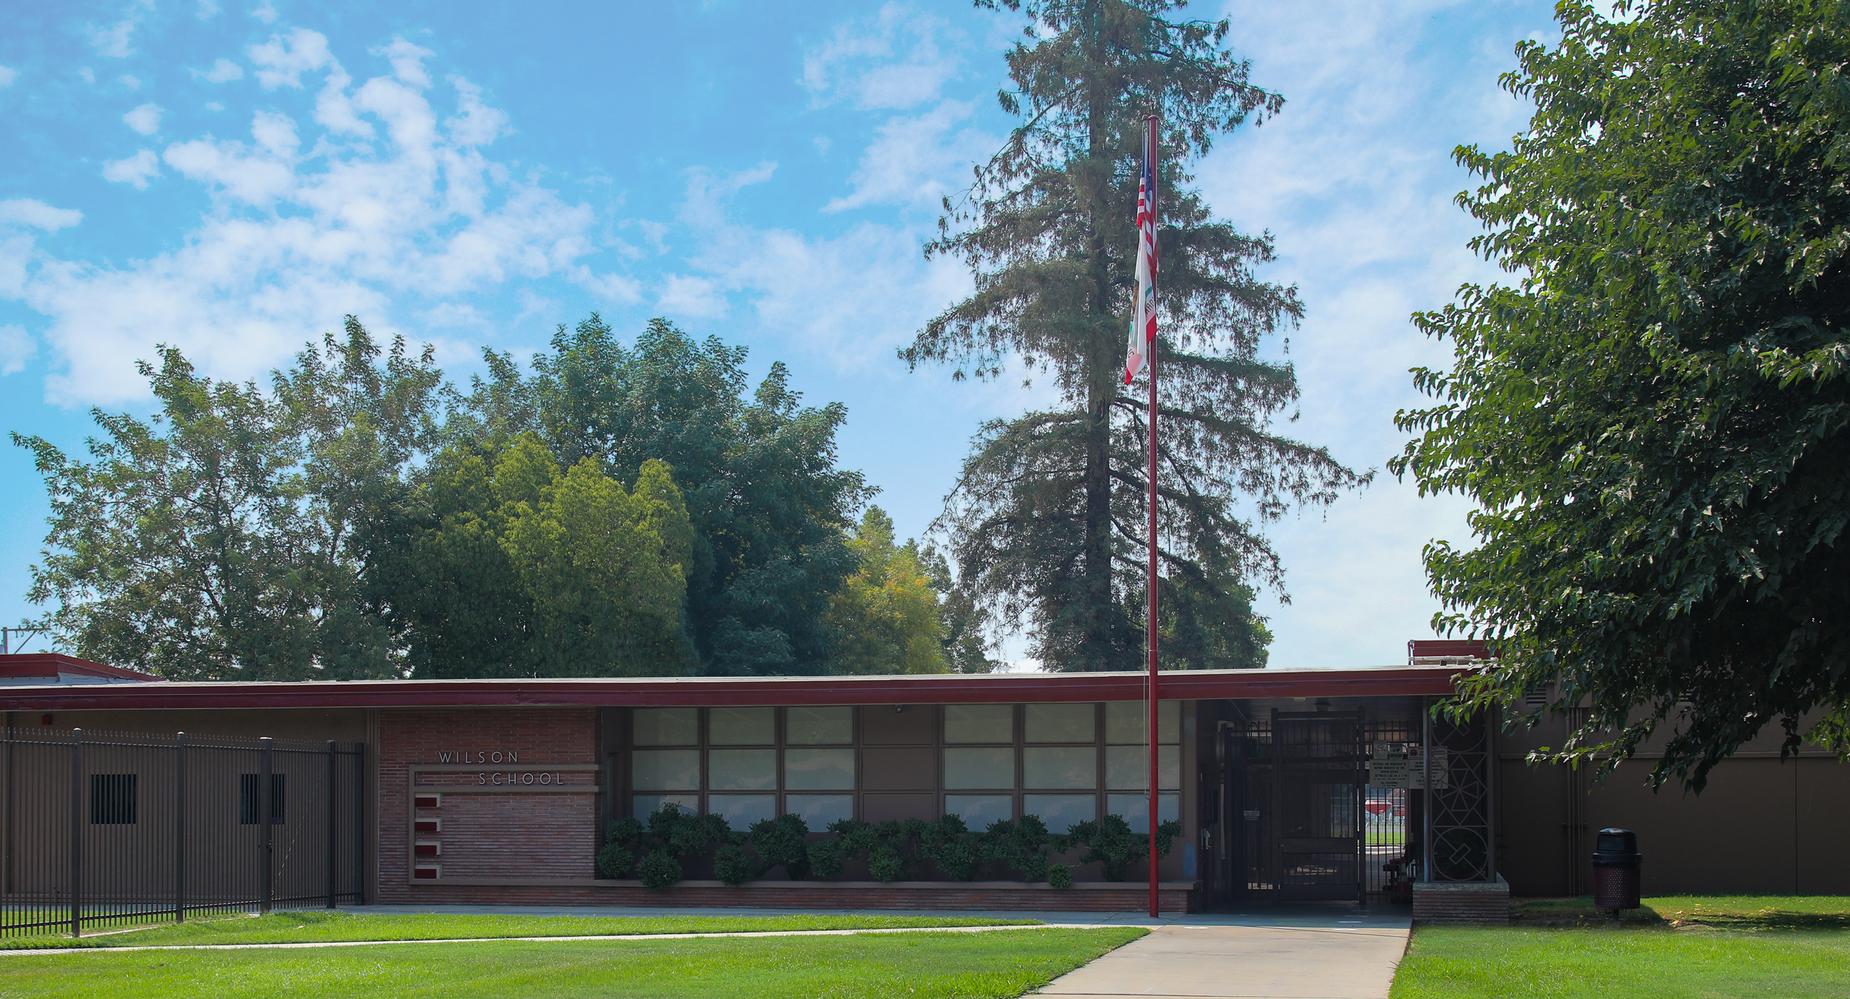 Wilson Elementary School Office Building